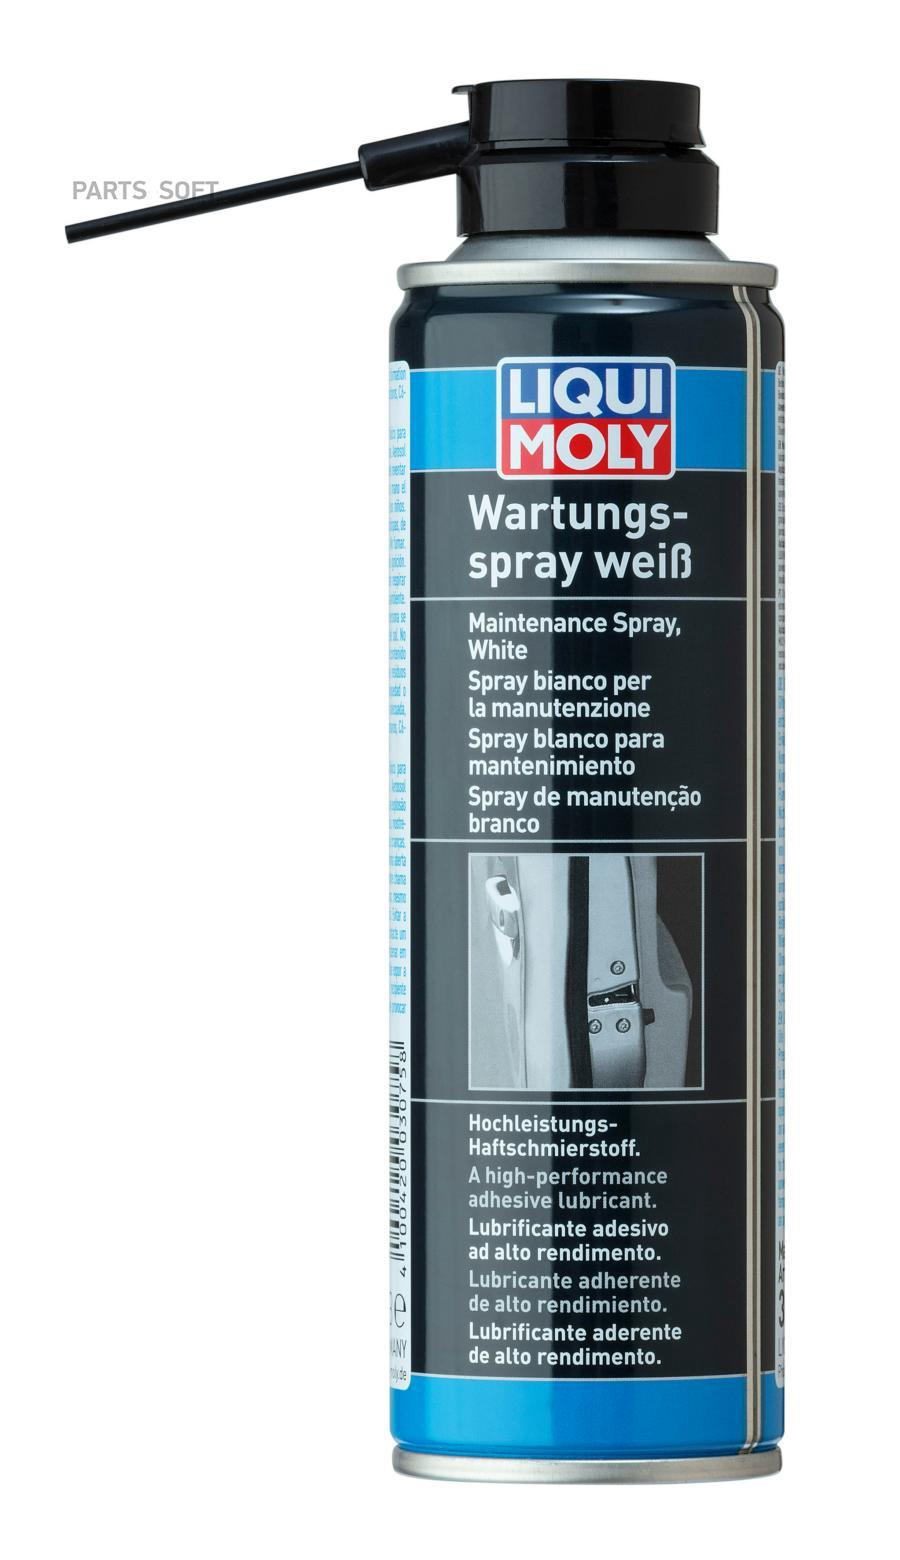 Смазка грязеотталкивающая белая Wartungs-Spray weiss (0,25л)